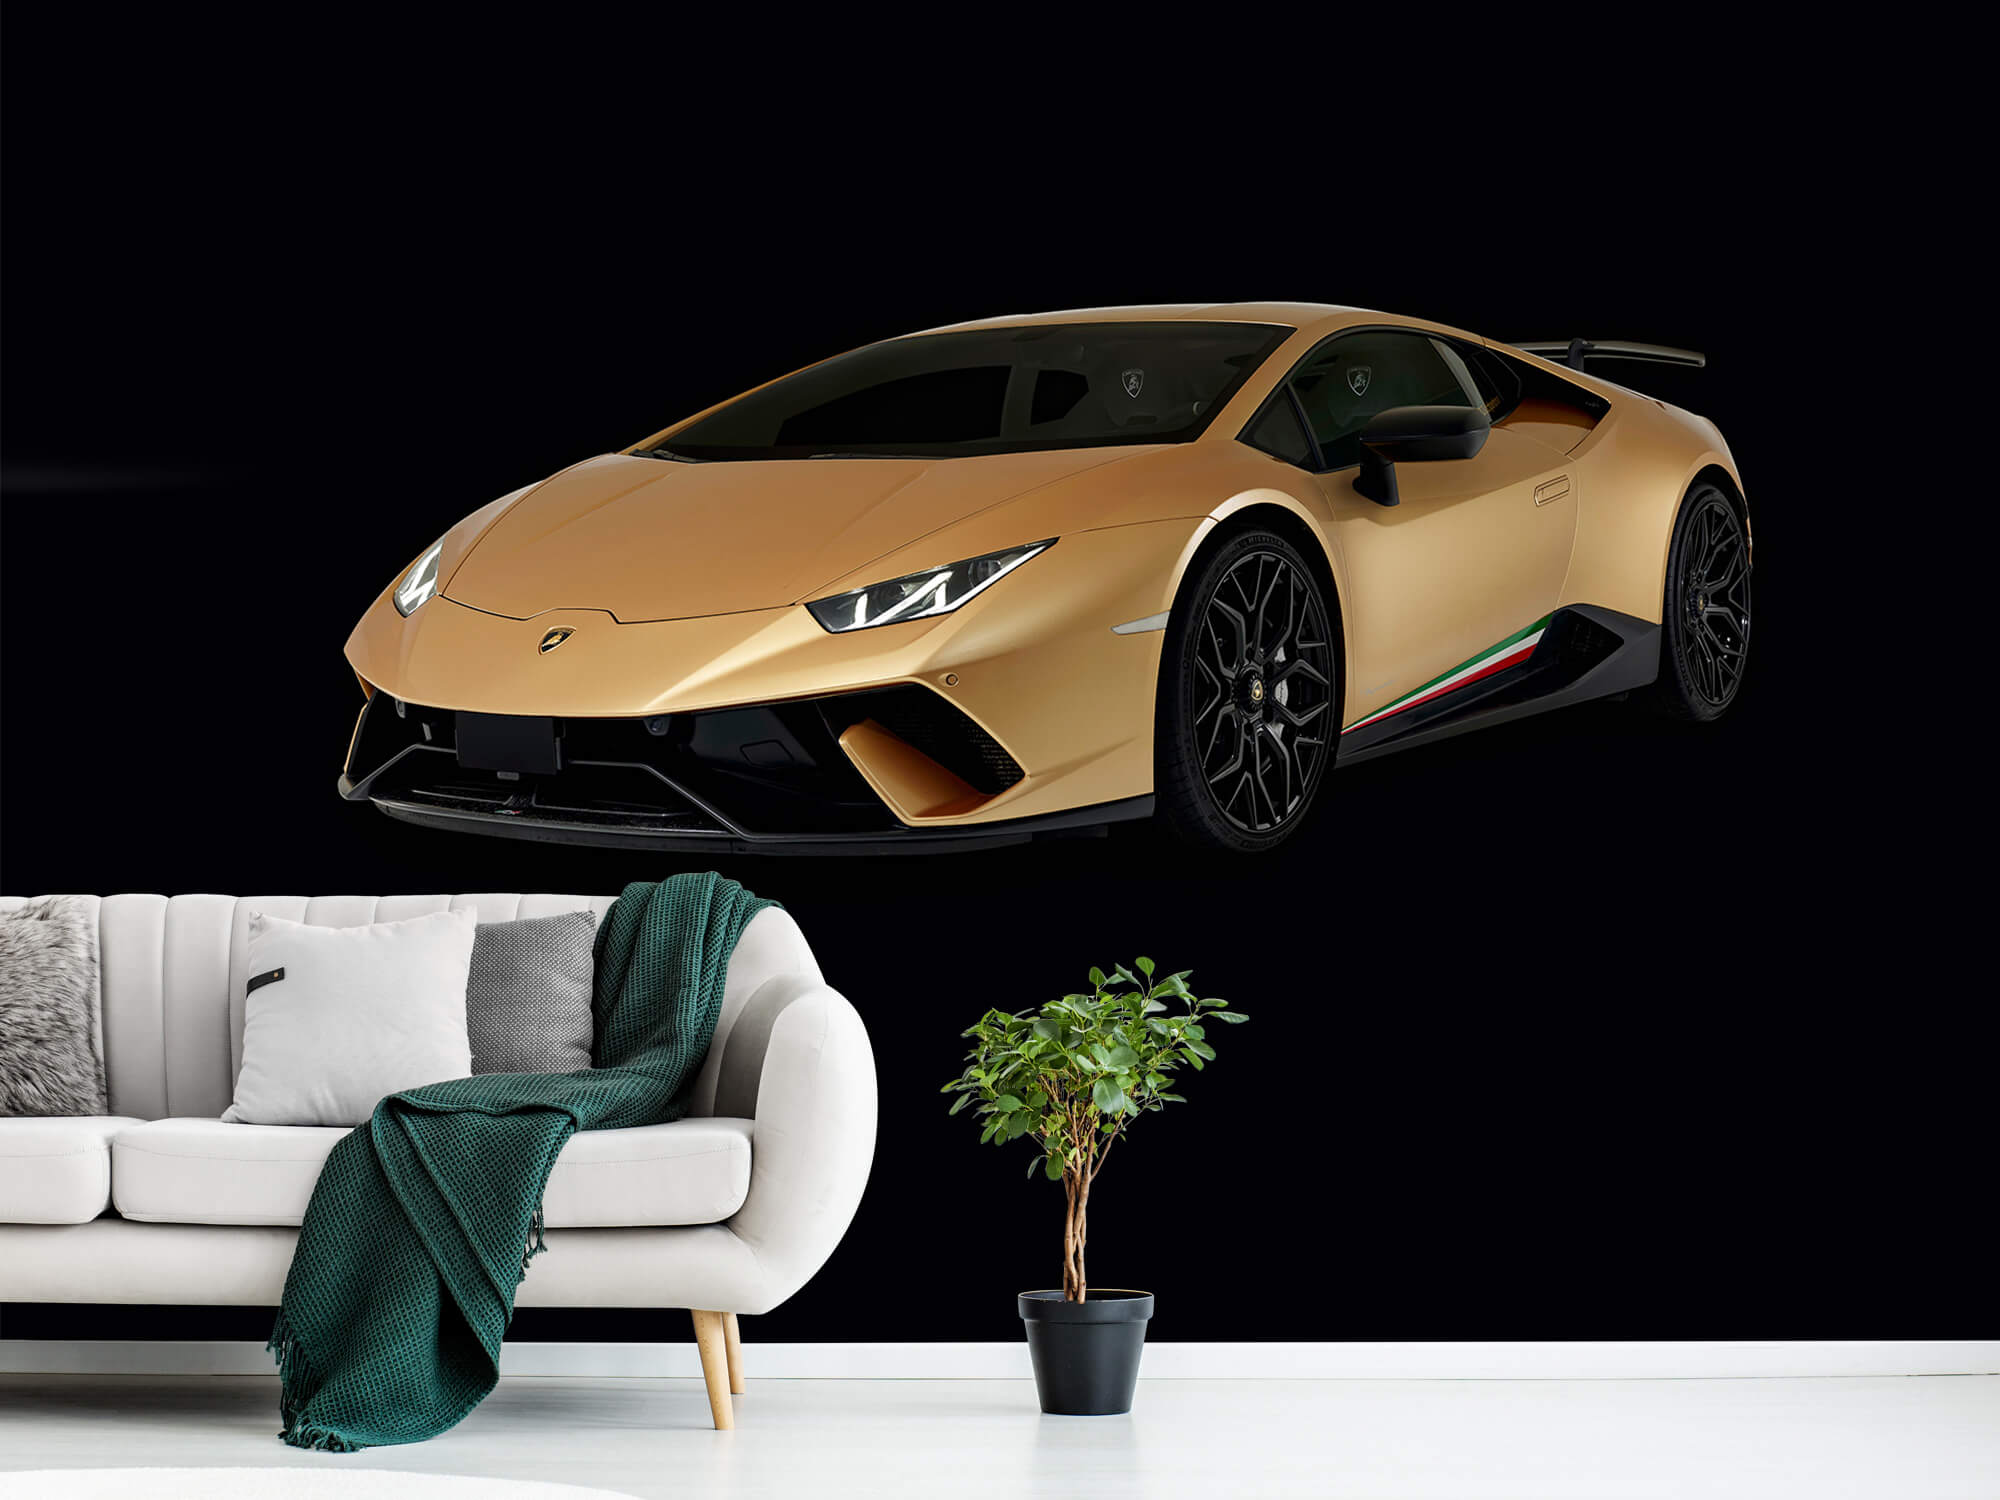 Wallpaper Lamborghini Huracán - Rechter voorkant, zwart 1